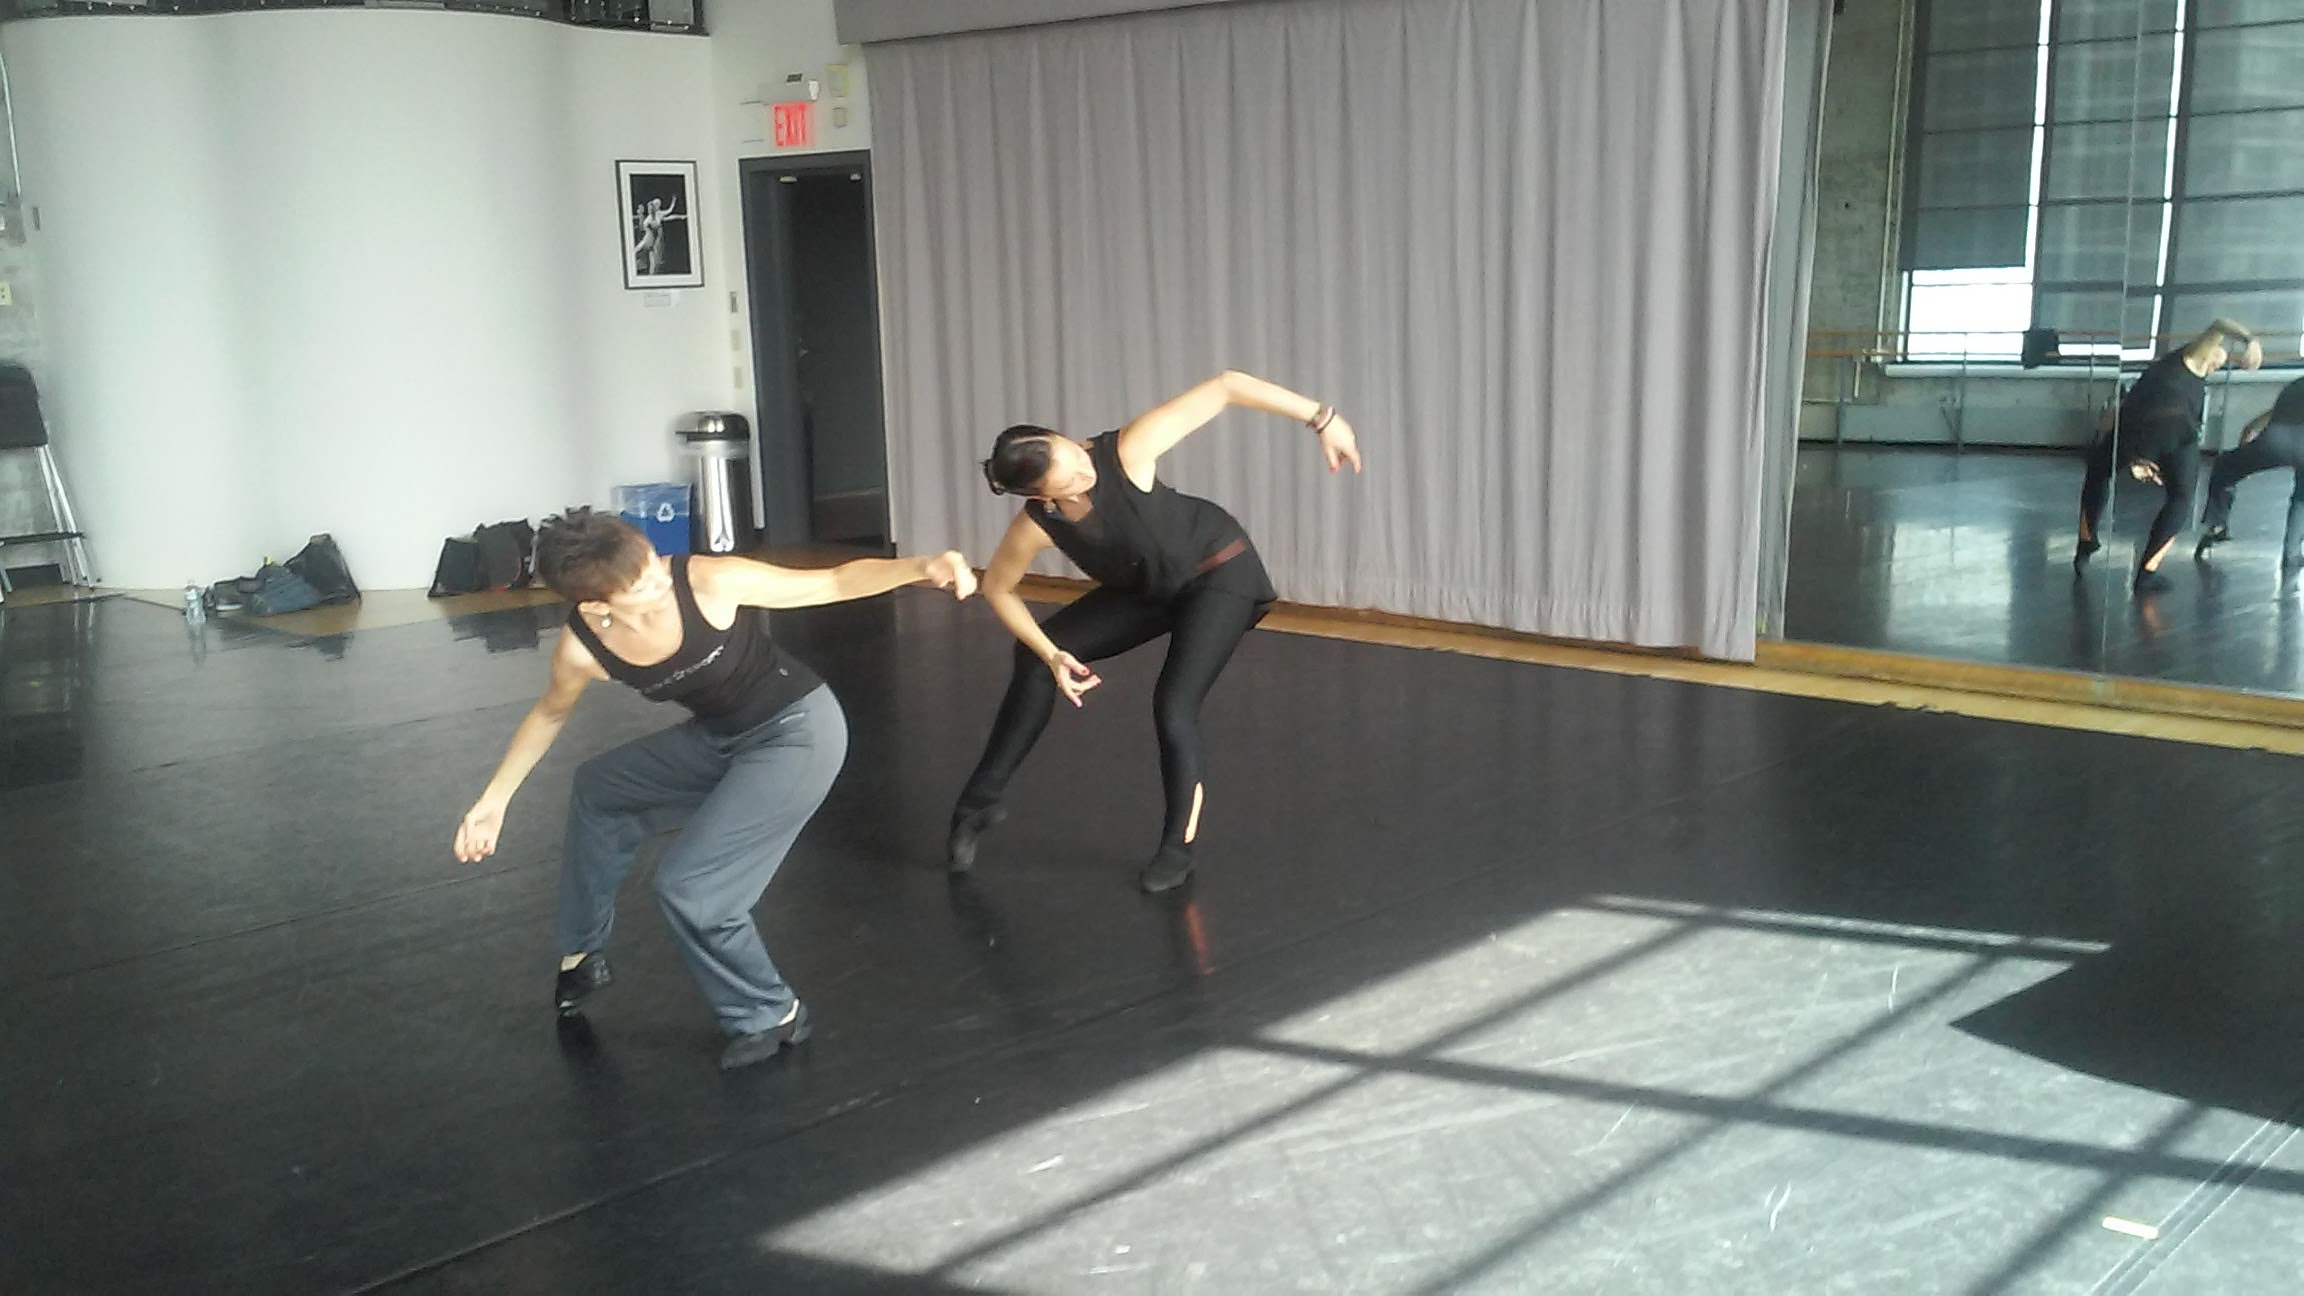 Mitzi and Claire at the Baryshnikov Arts Center